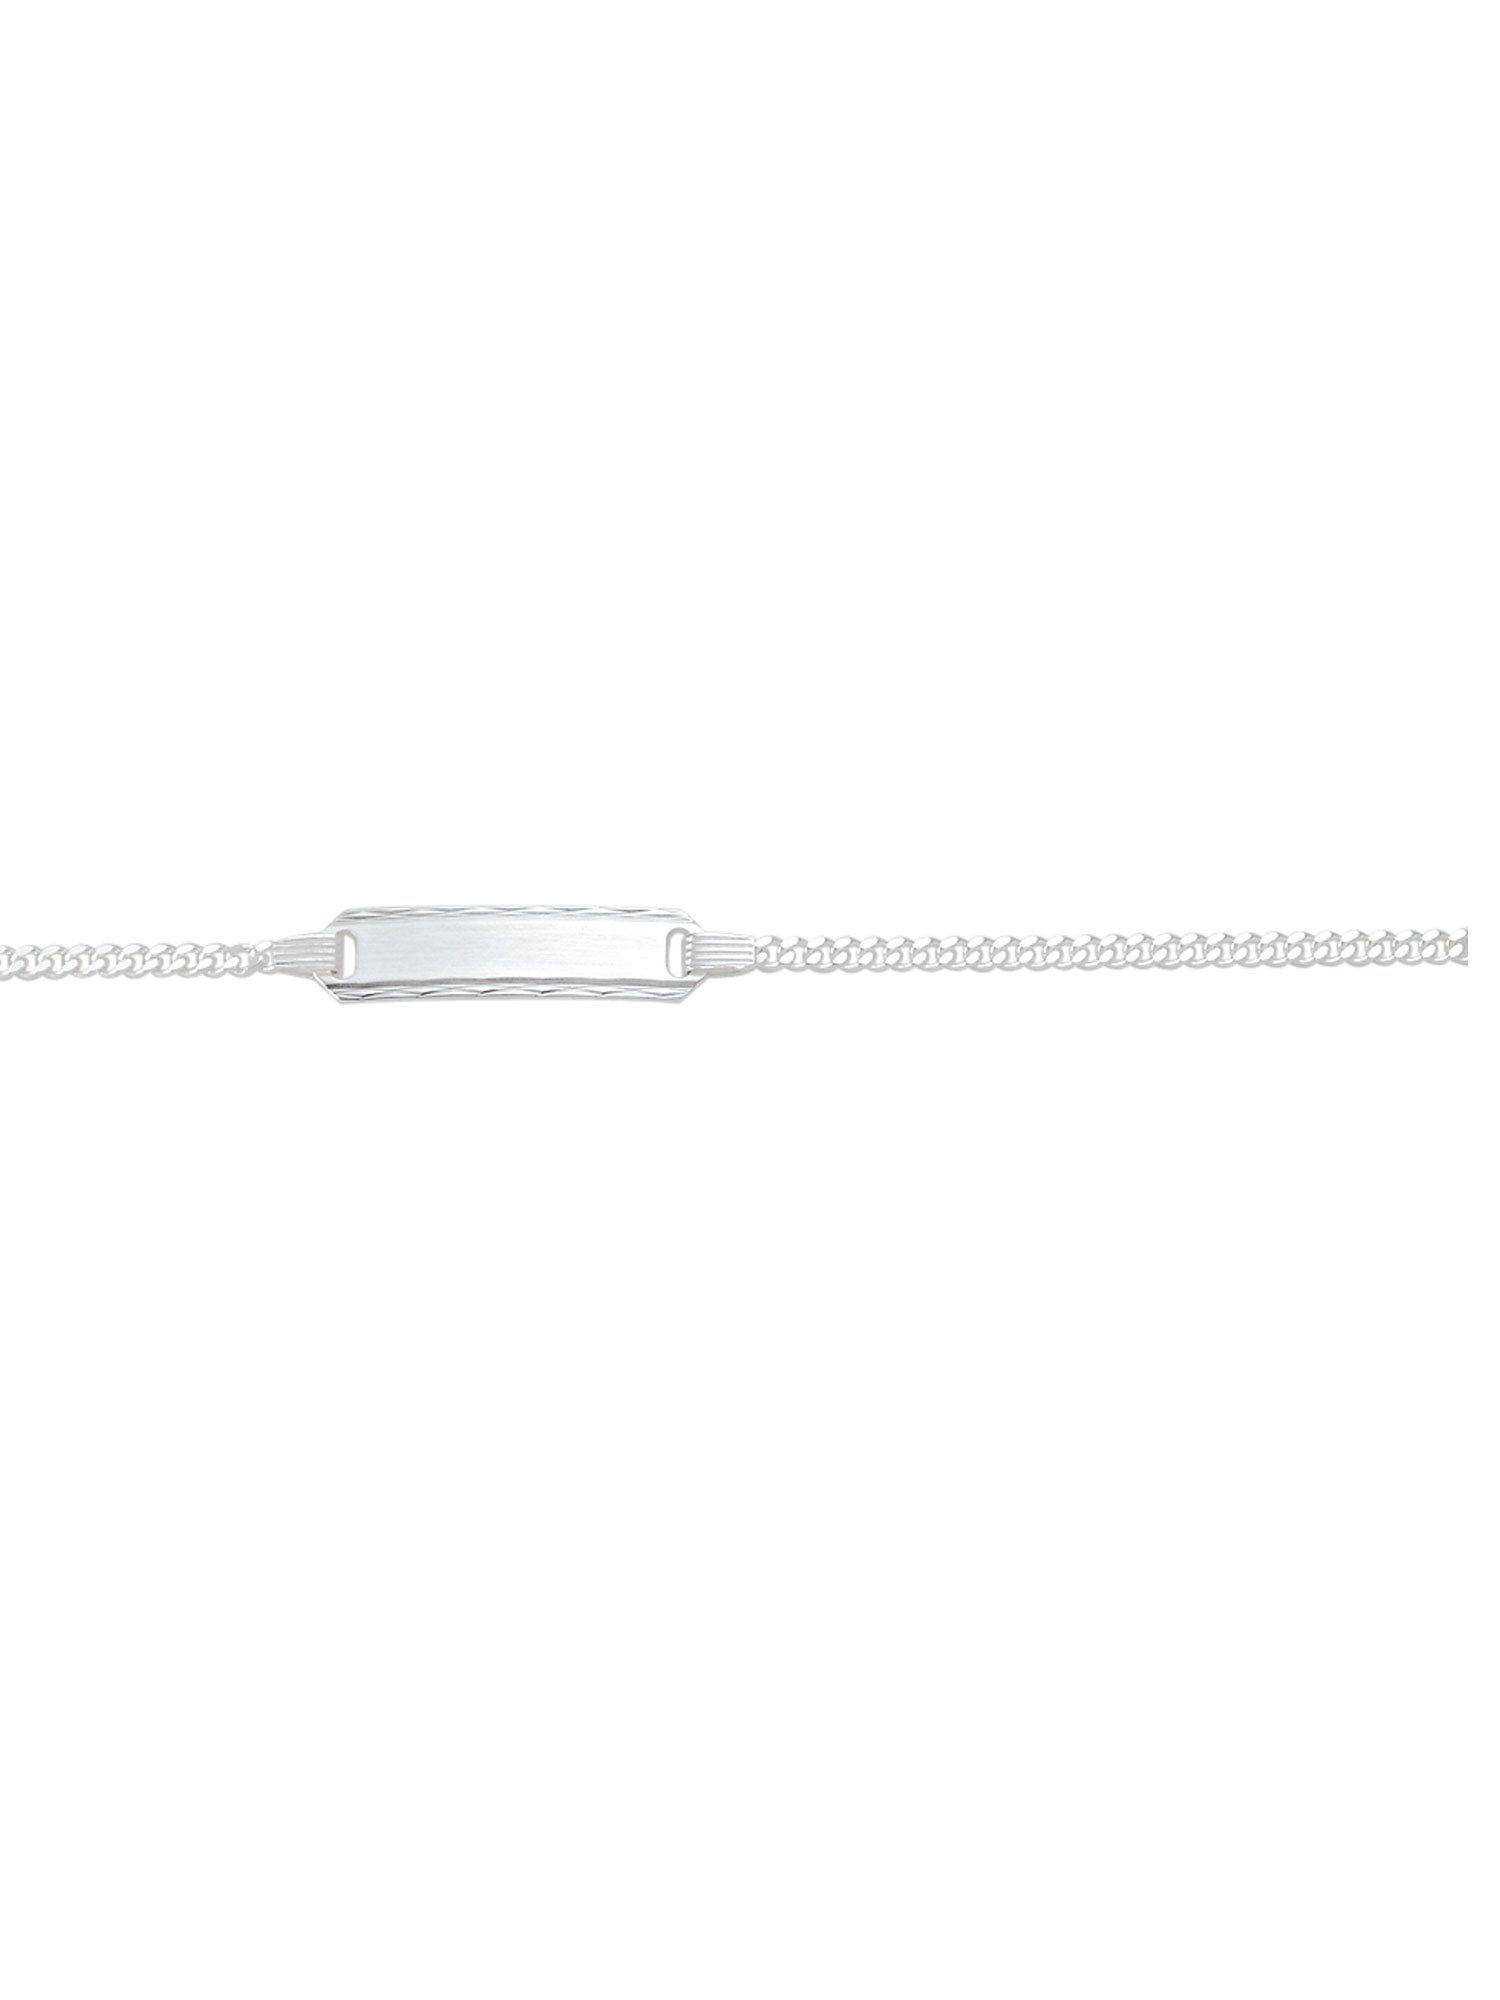 Adelia´s Silberarmband »Silber Armbänder« 925 Sterling Silber Flach Panzerkette